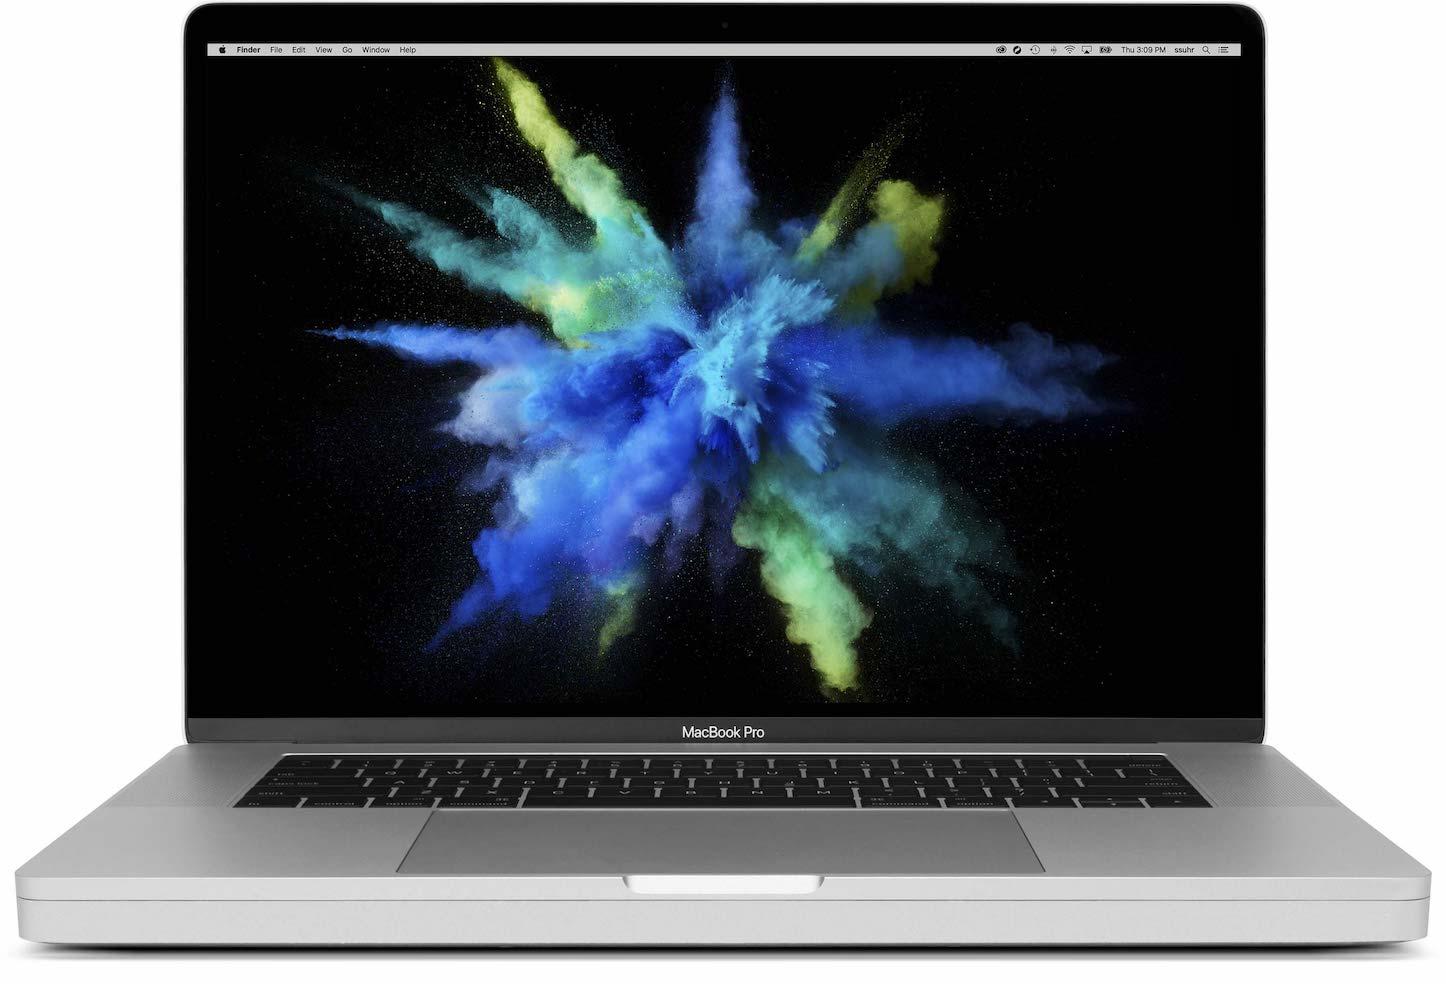 Owc mackbook pro dock